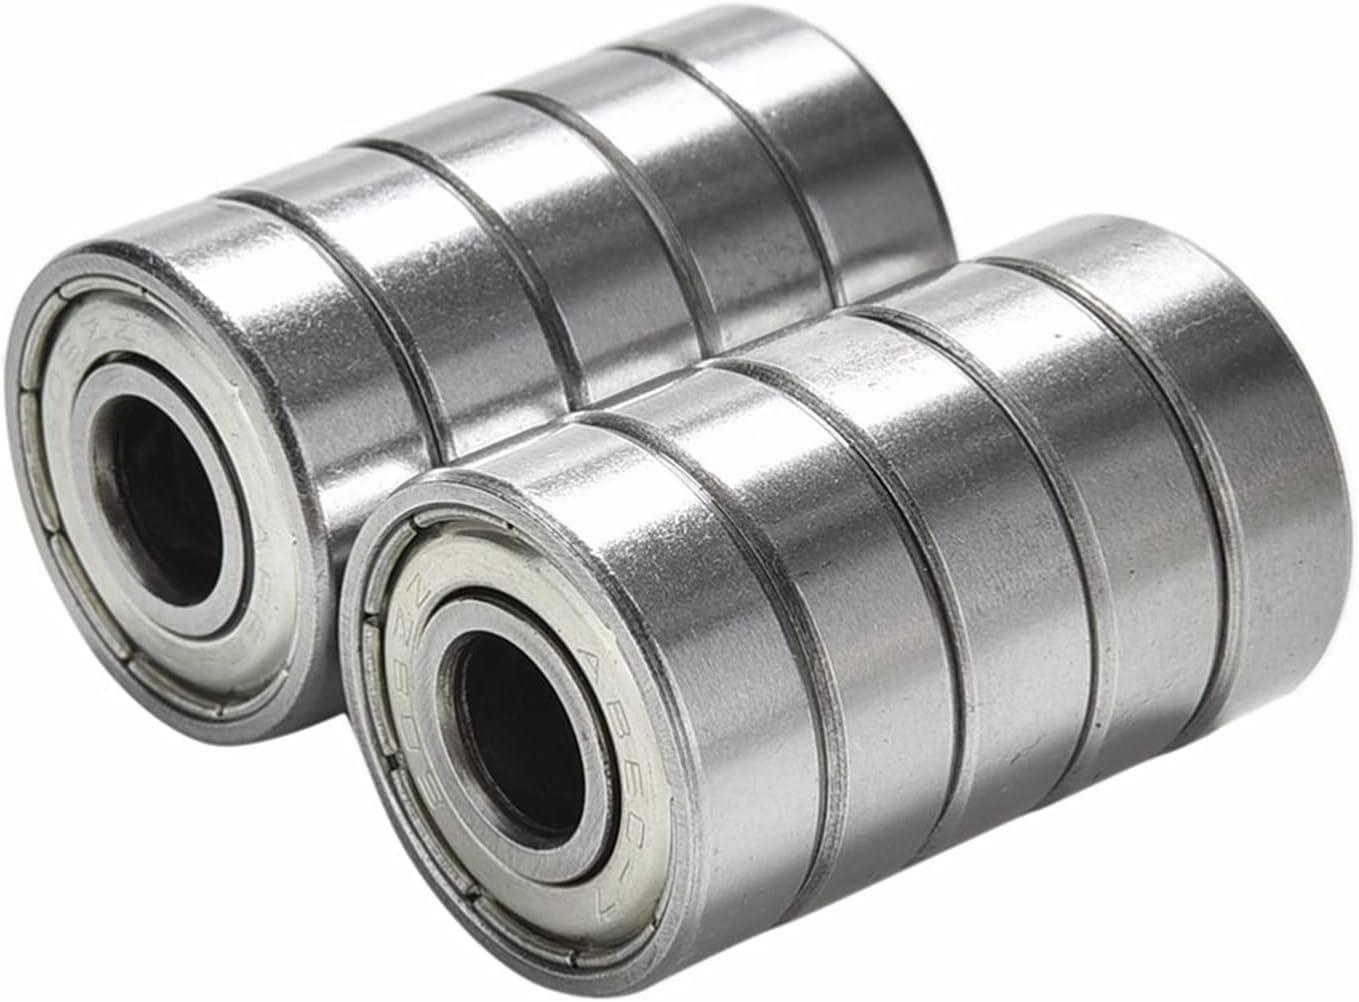 Super sale HHKHFA 10PCS lot ABEC 7 608ZZ Superior Ro Bearings Shafts Steel Stainless